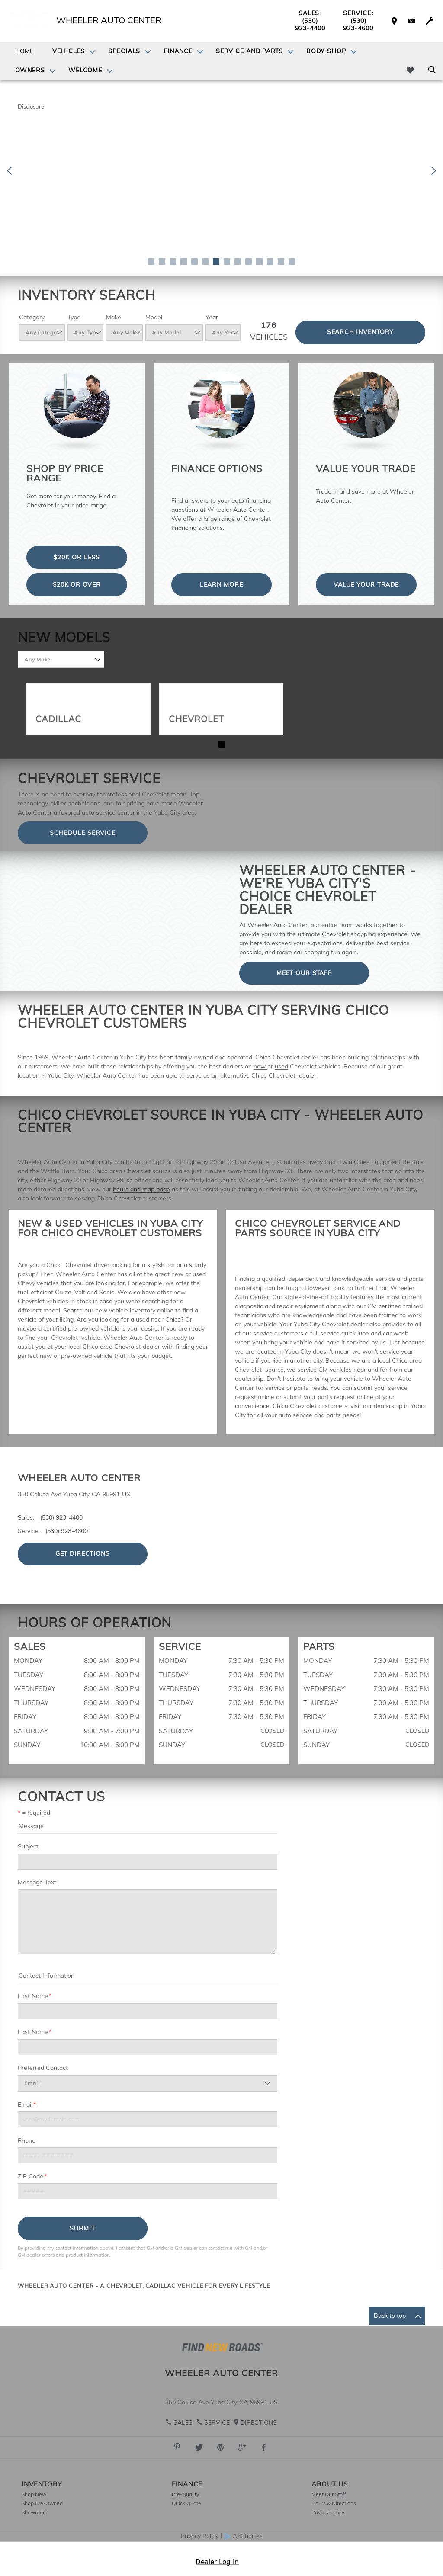 Wheeler Chevrolet Cadillac Mazda Website History